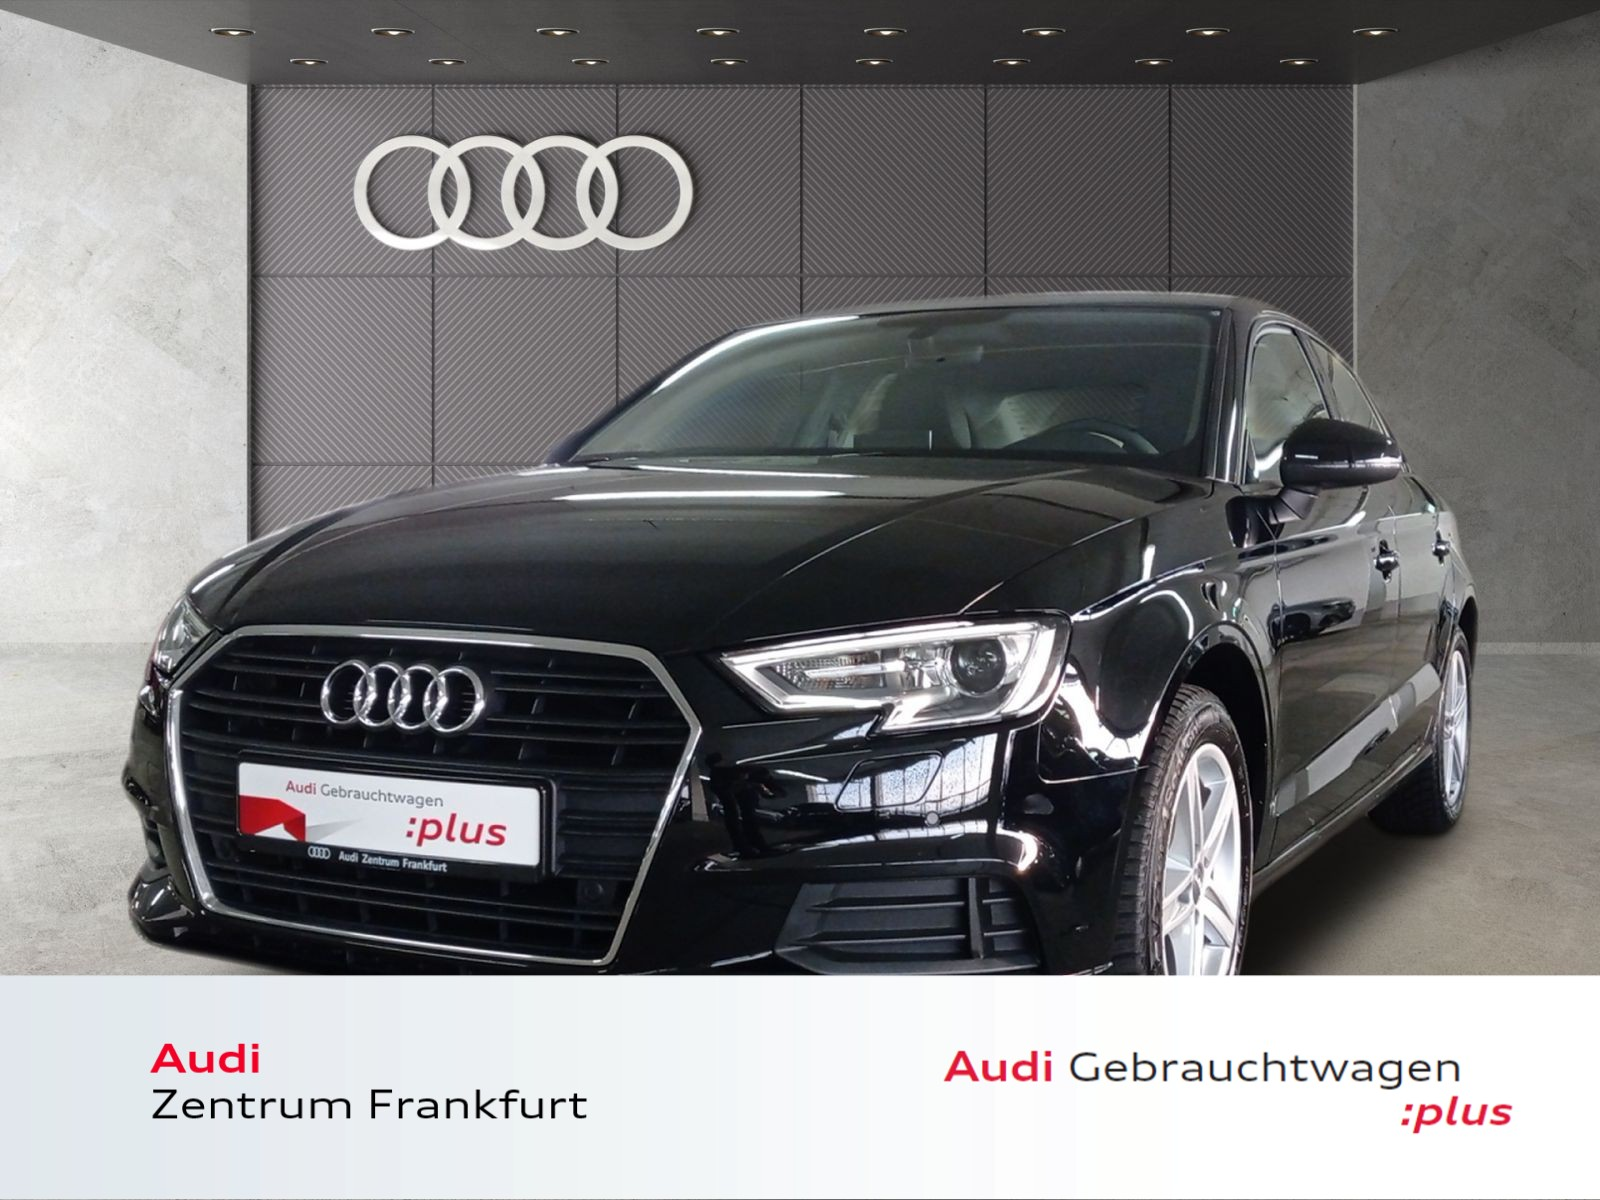 Audi A3 Limousine 35 TFSI Navi Xenon PDC Sitzheizung Klima, Jahr 2019, Benzin